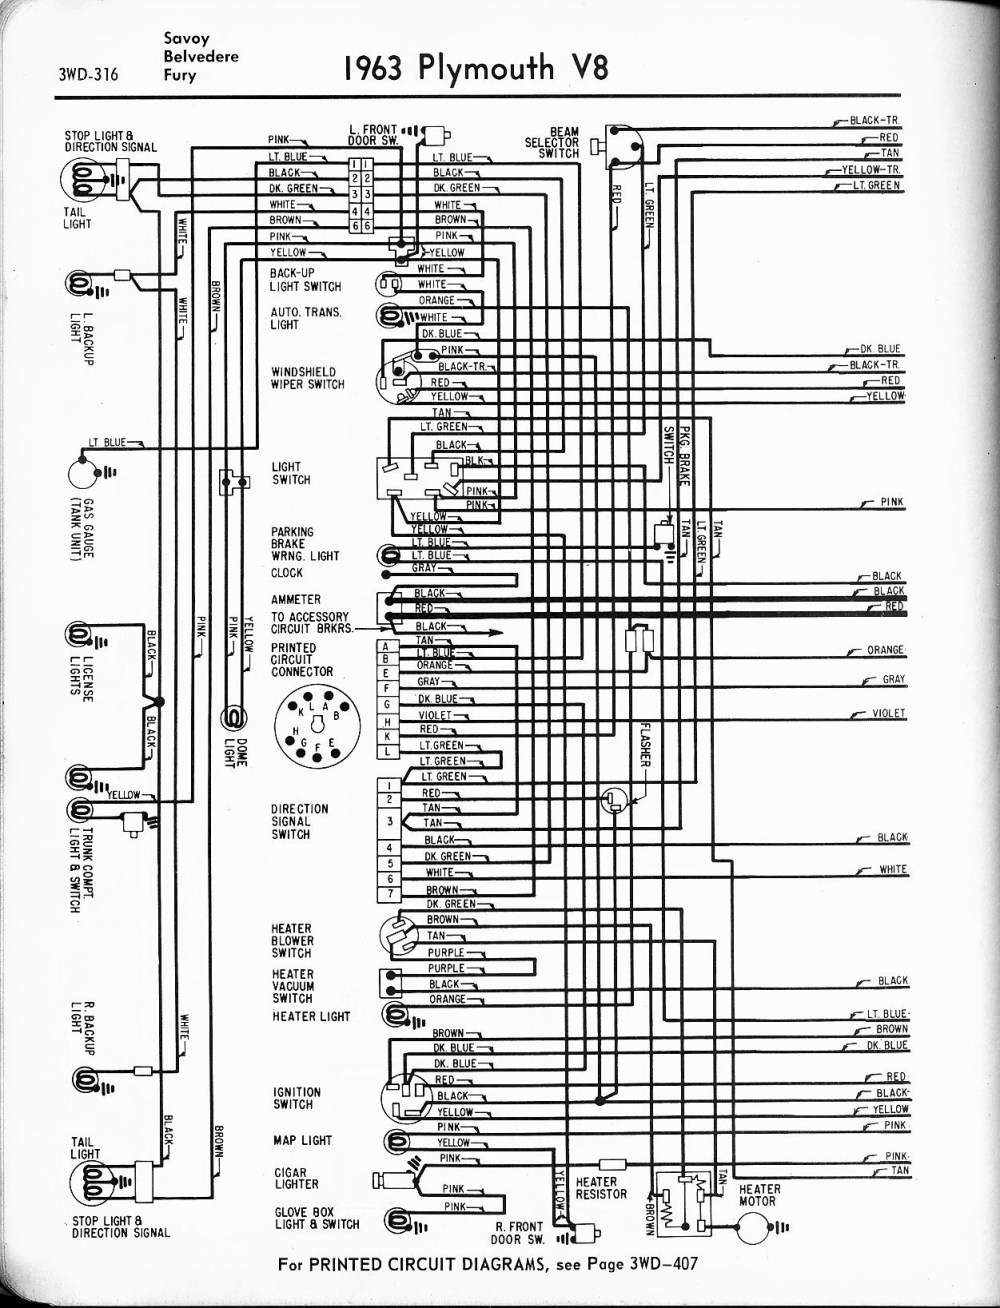 medium resolution of 1963 plymouth wiring diagram wiring diagram completed 63 plymouth wiring diagram